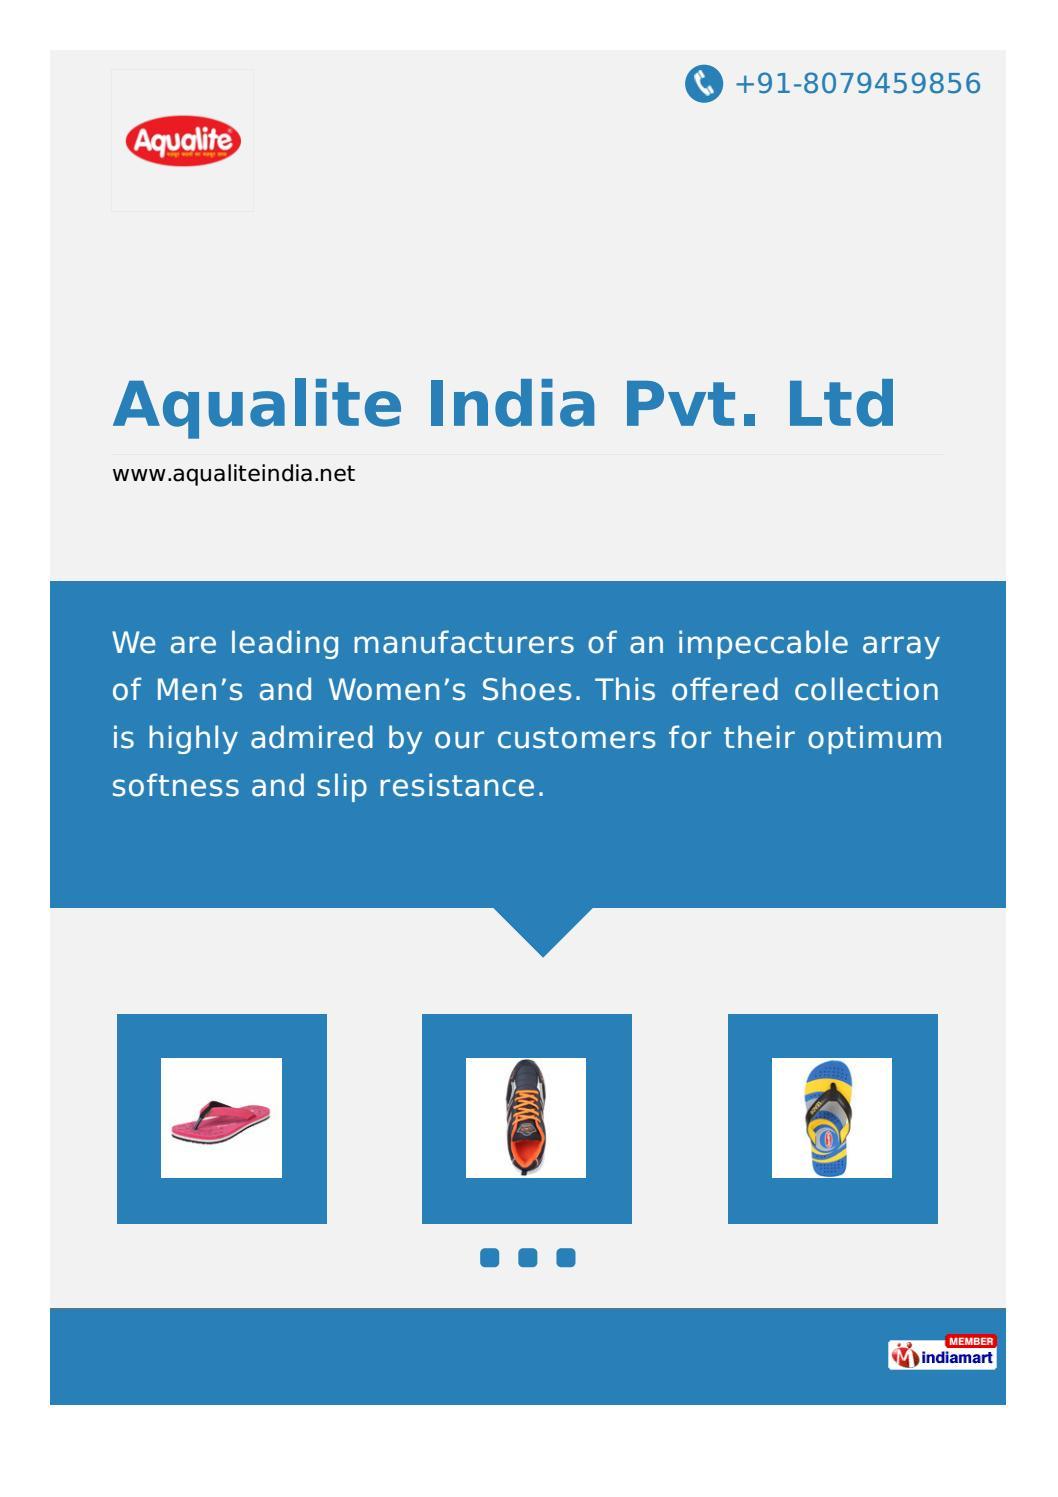 Aqualite india pvt ltd by Aqualite